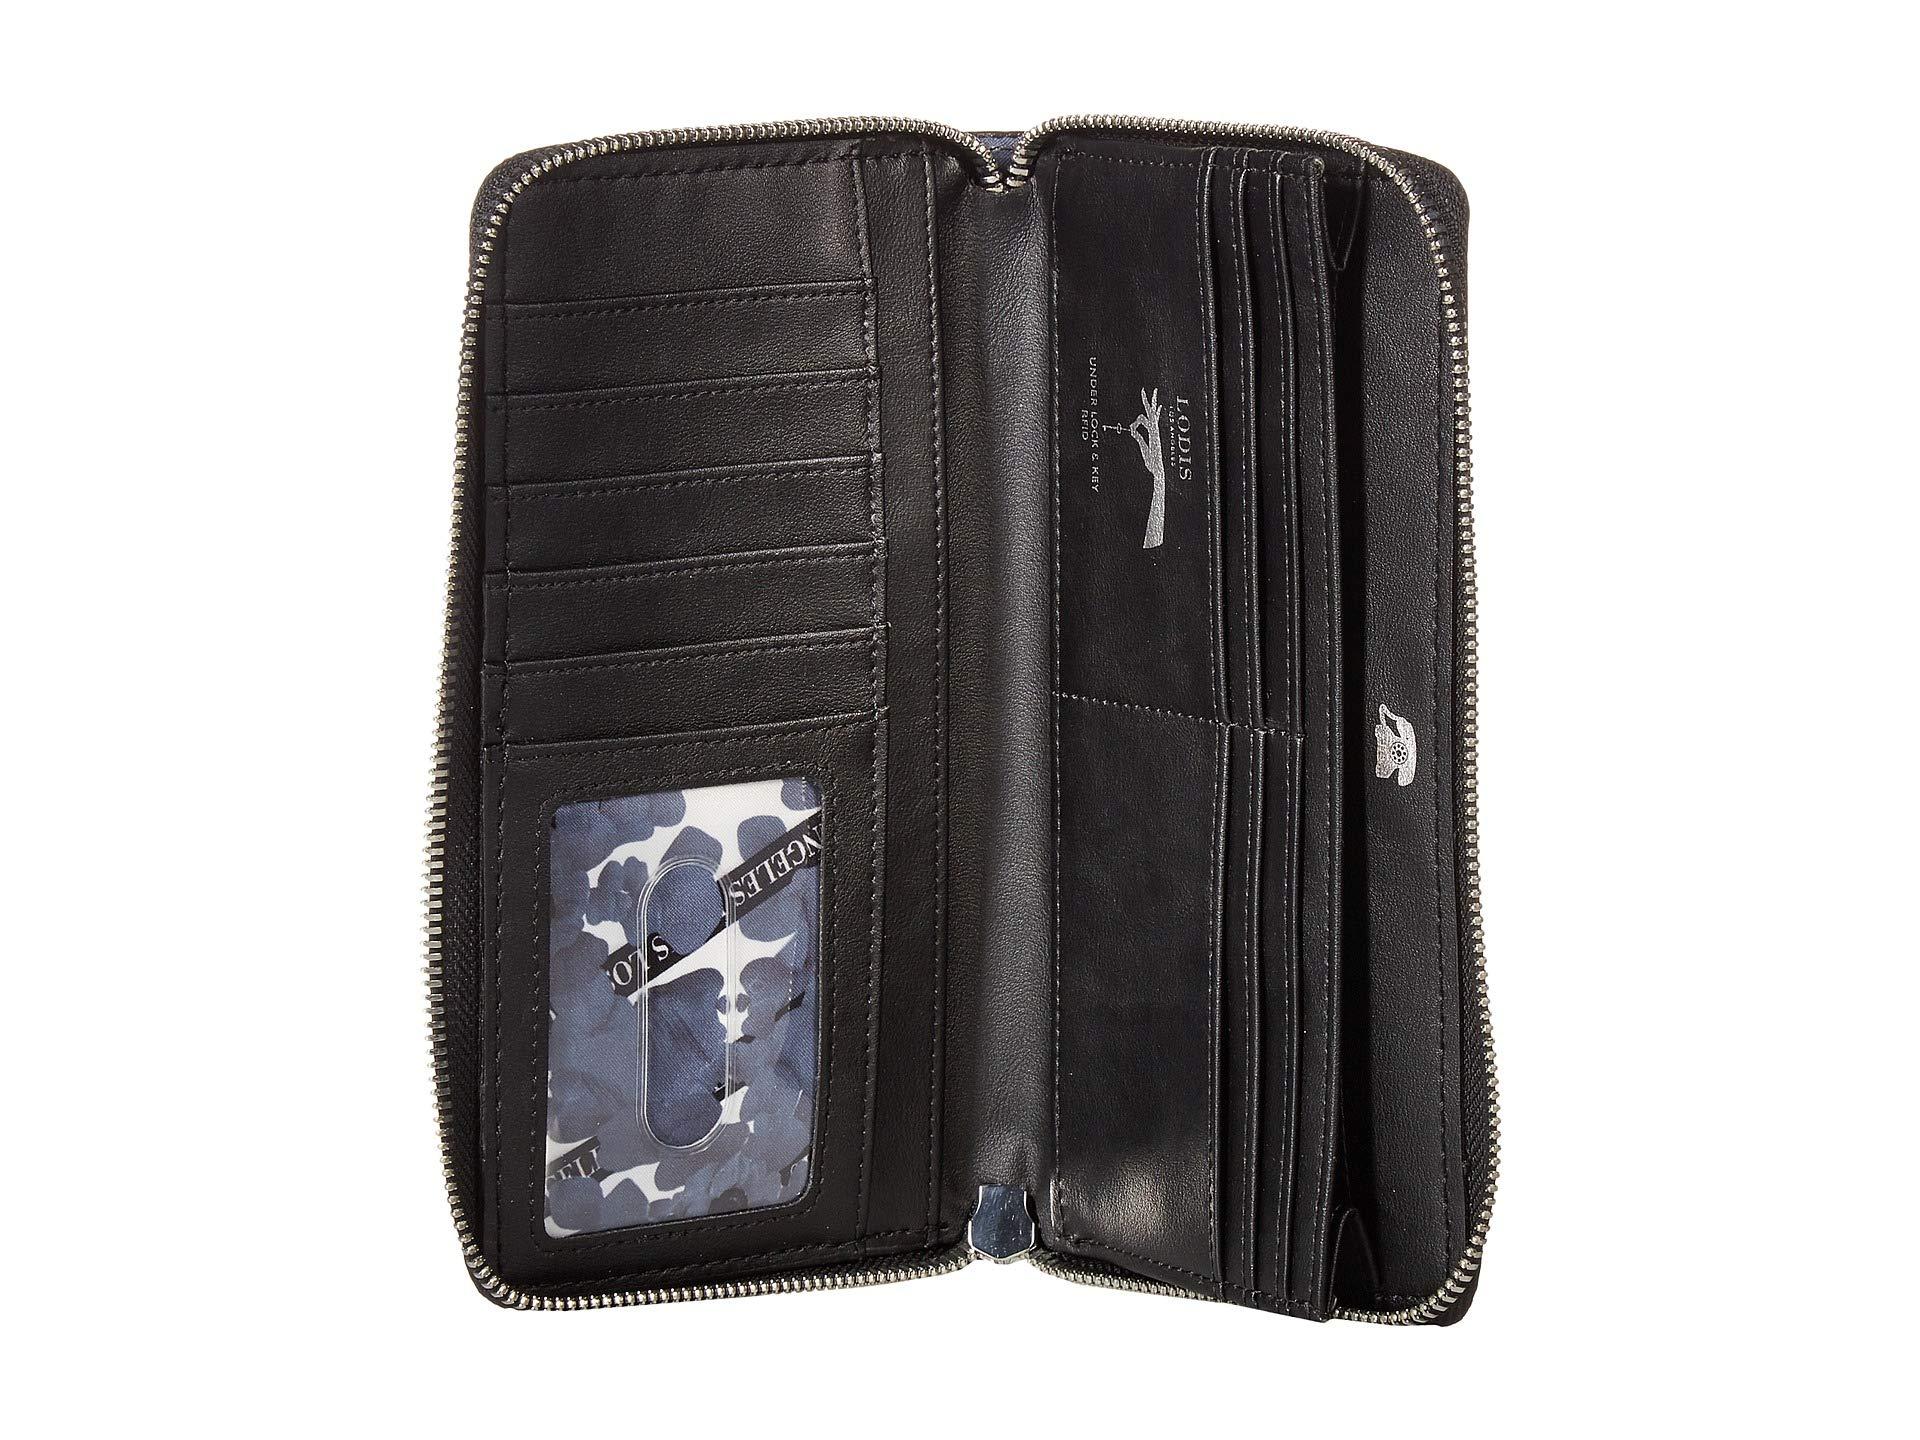 Black Zip Accessories Wallet Saratoga Perla Lodis qxfTaw8nU